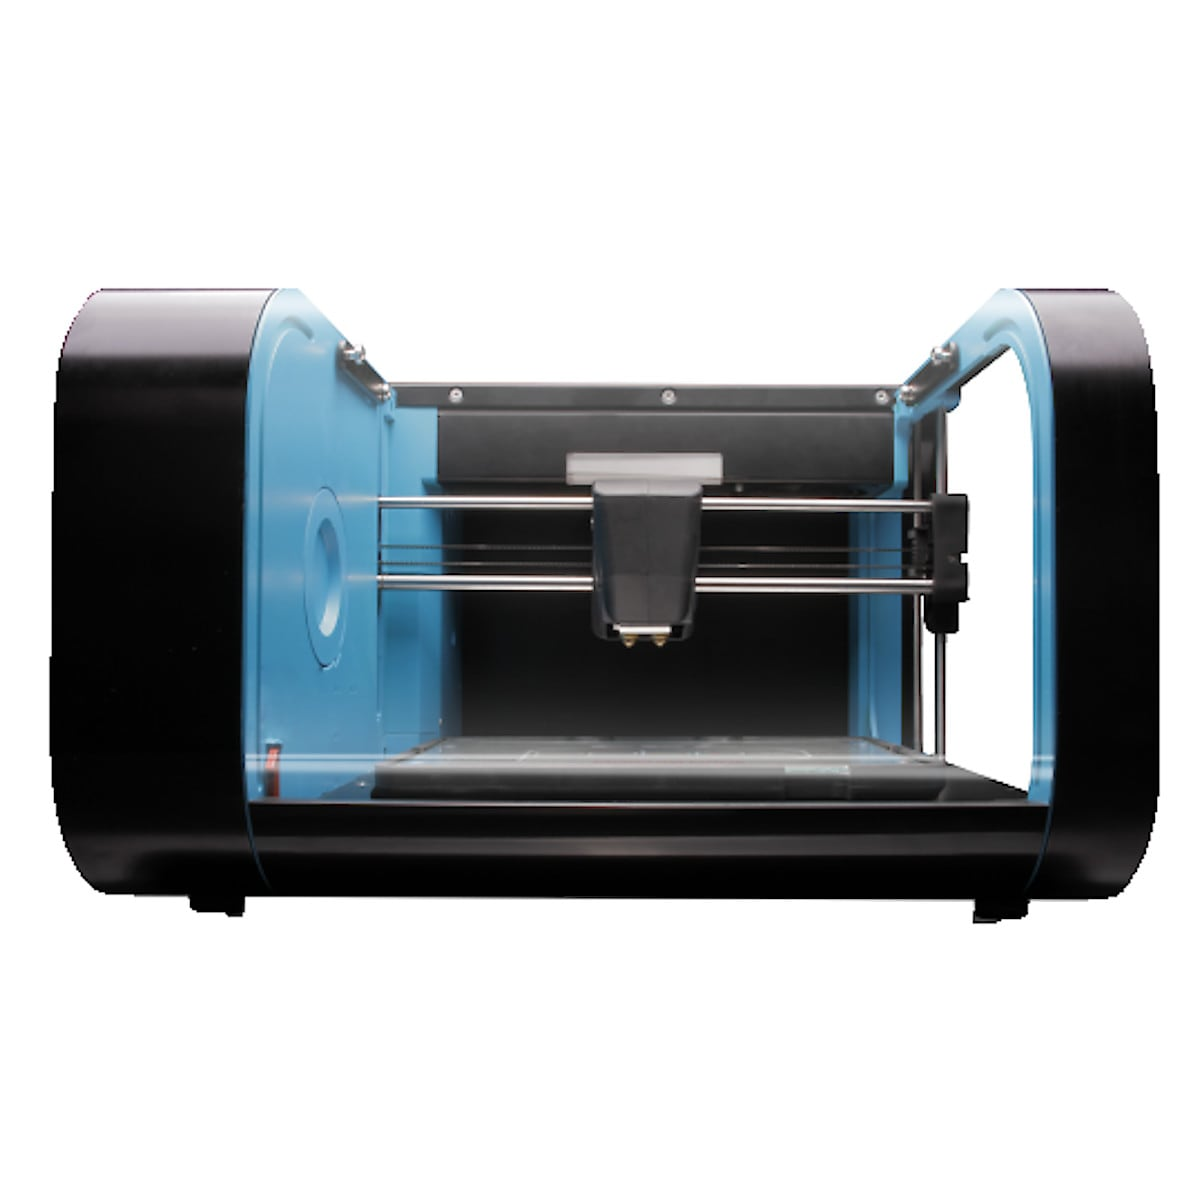 Robox 3D-printer